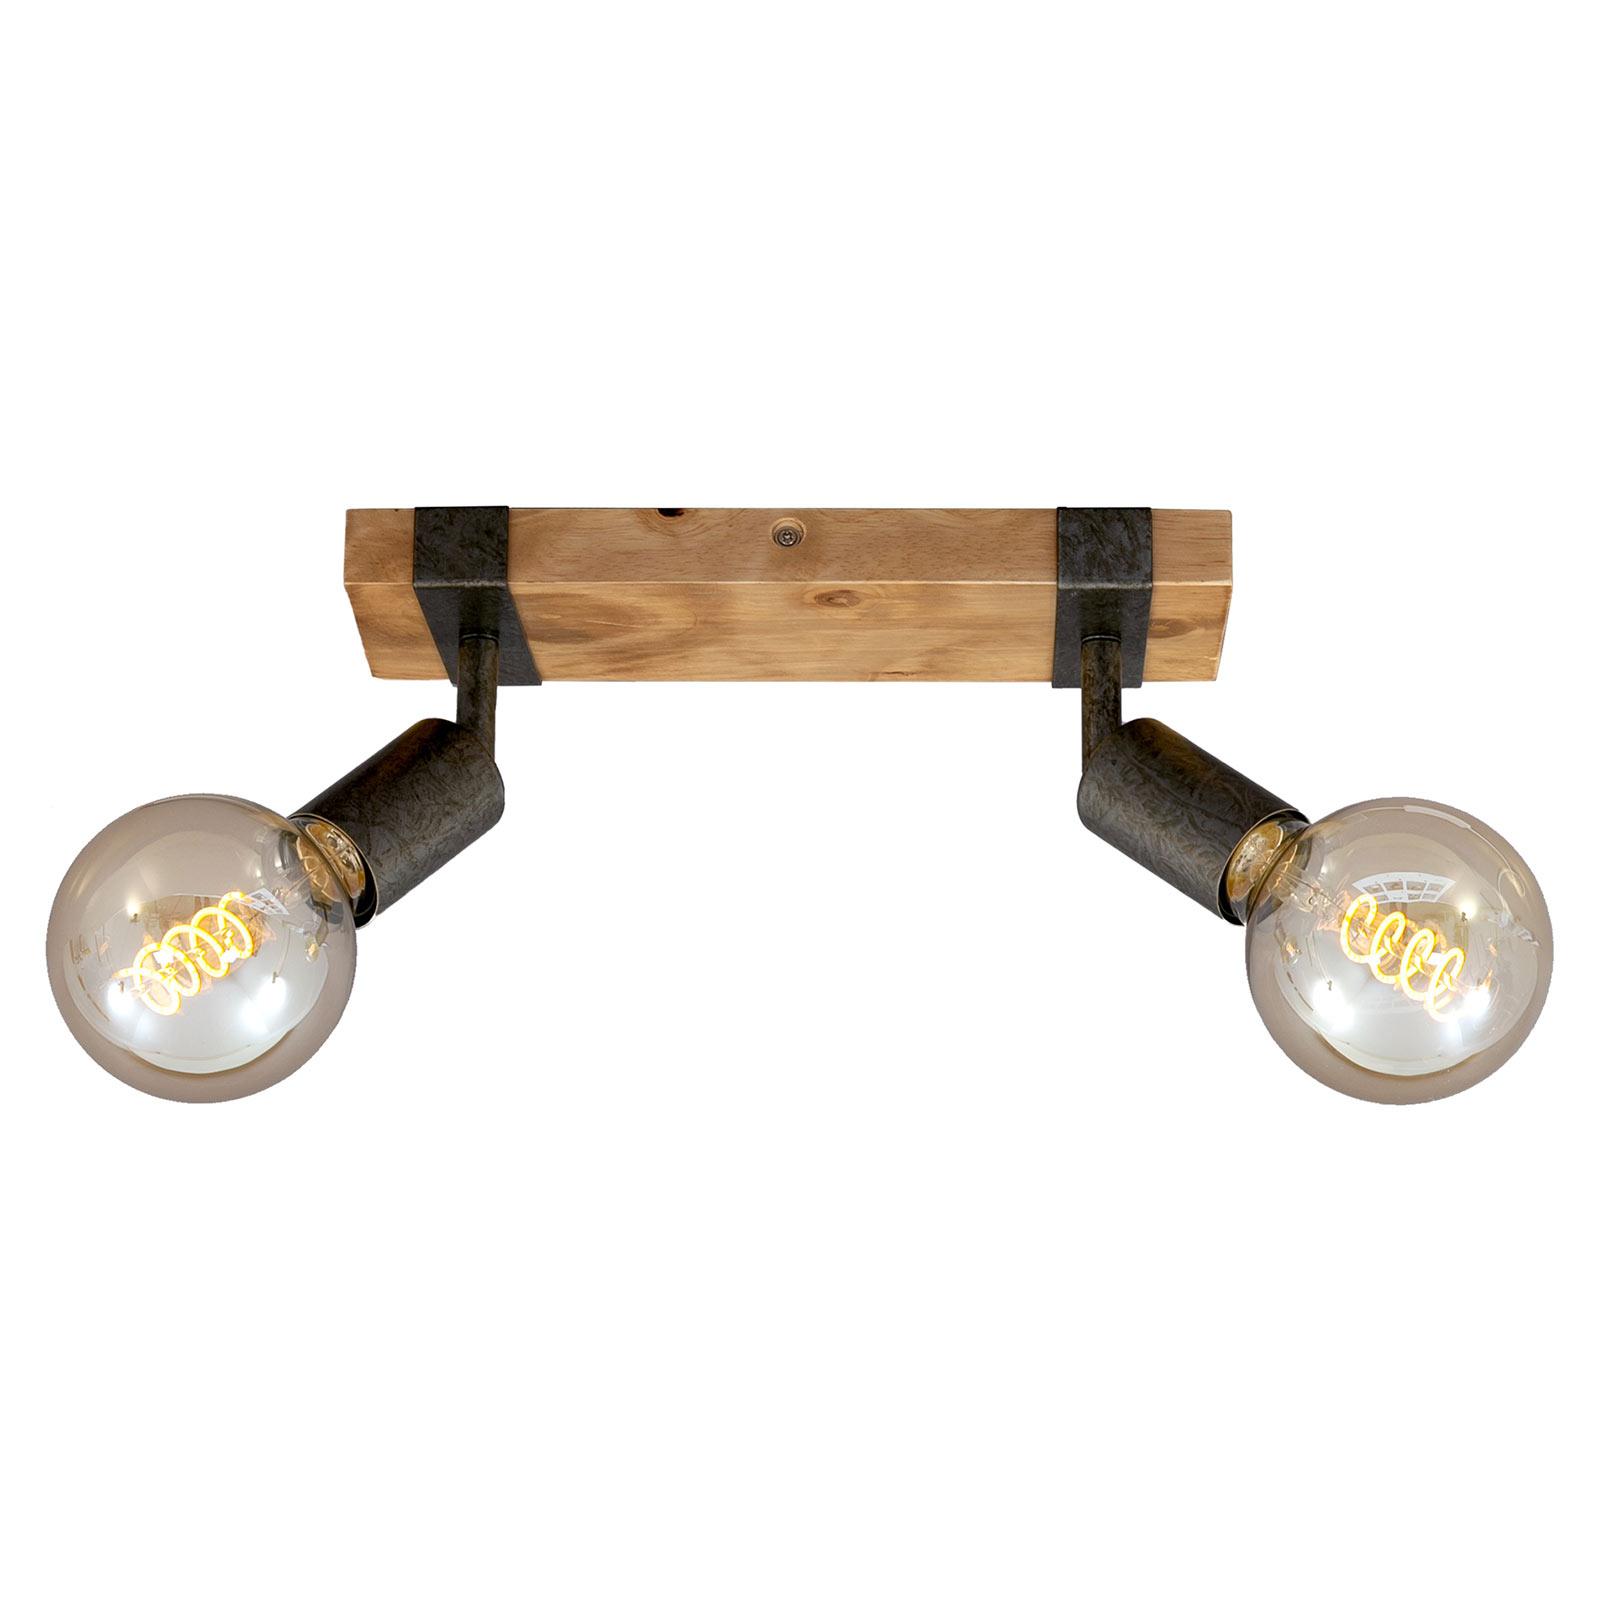 Taklampe Wood Basic, 2 lyskilder